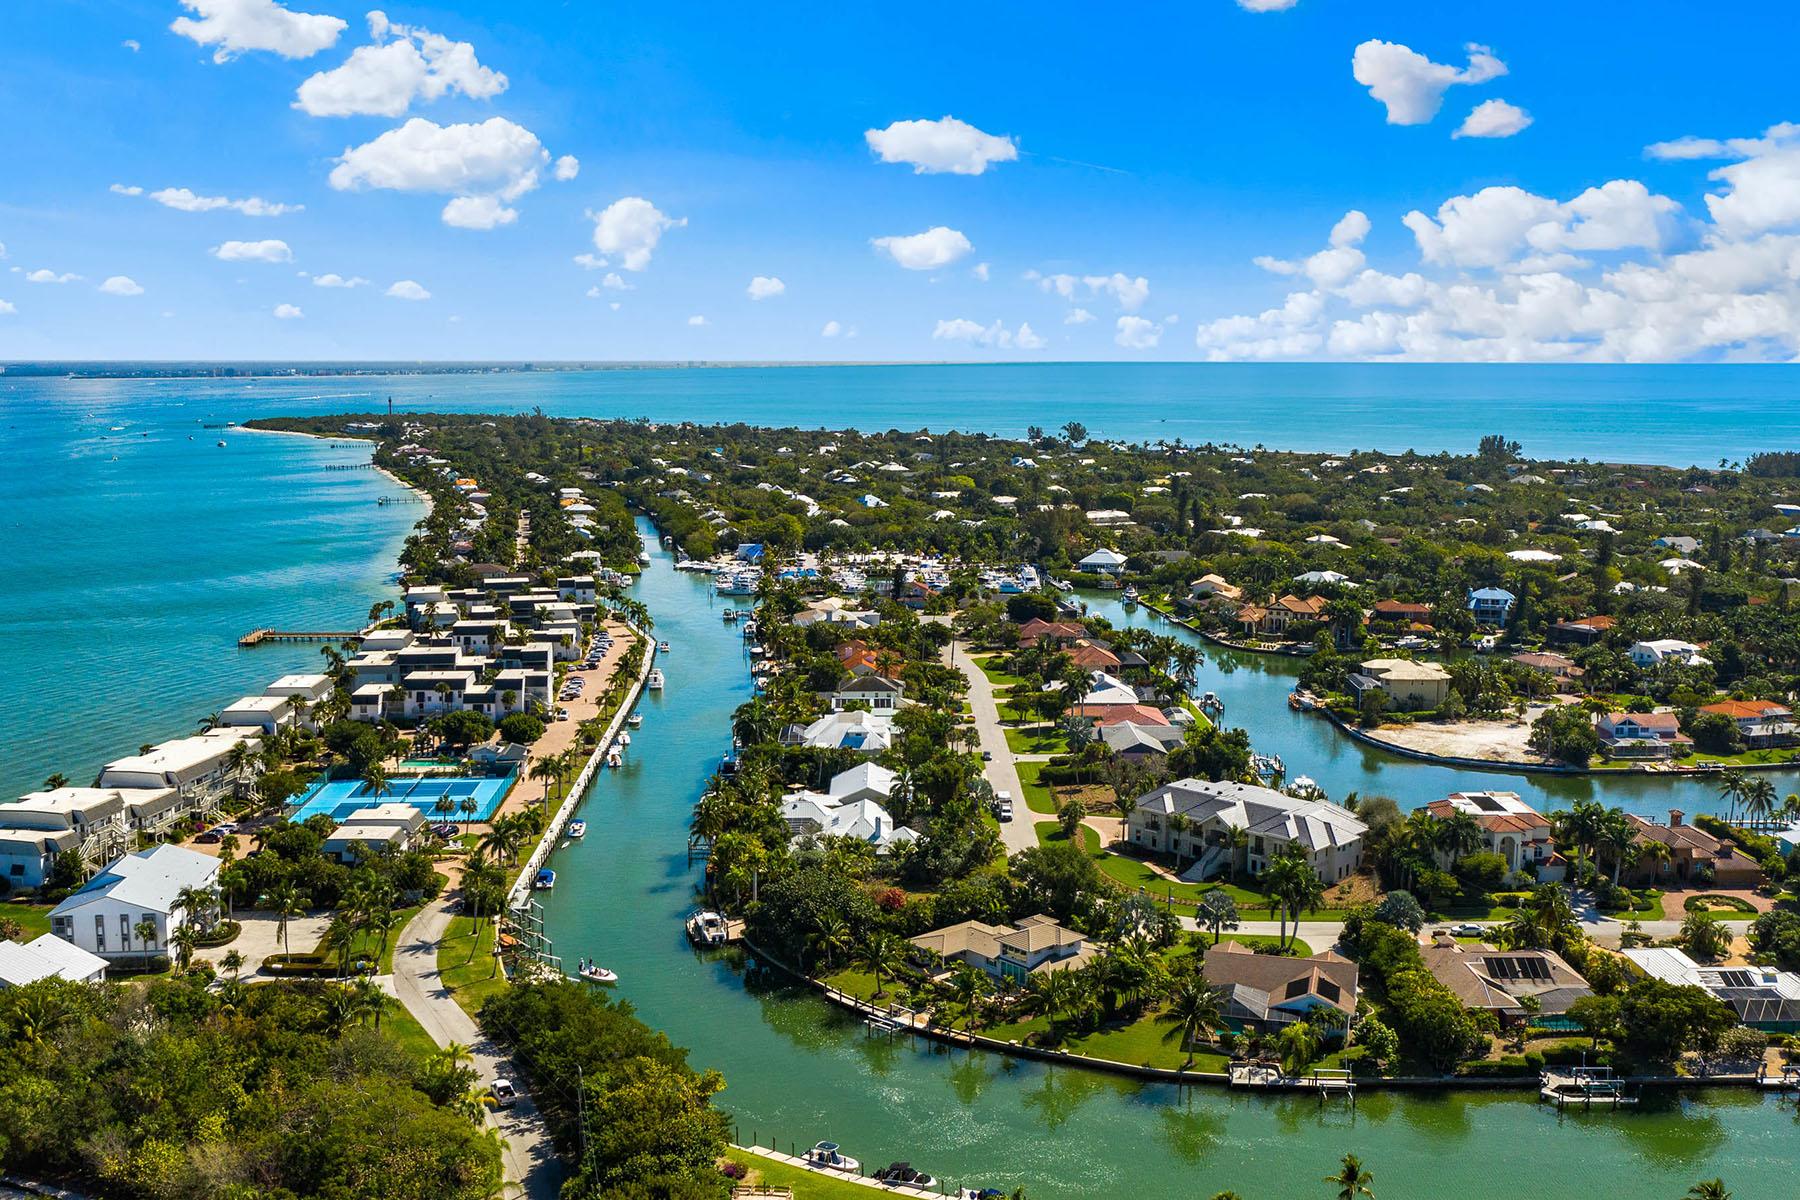 Land for Sale at SHELL HARBOR 836 Limpet Drive, Sanibel, Florida 33957 United States